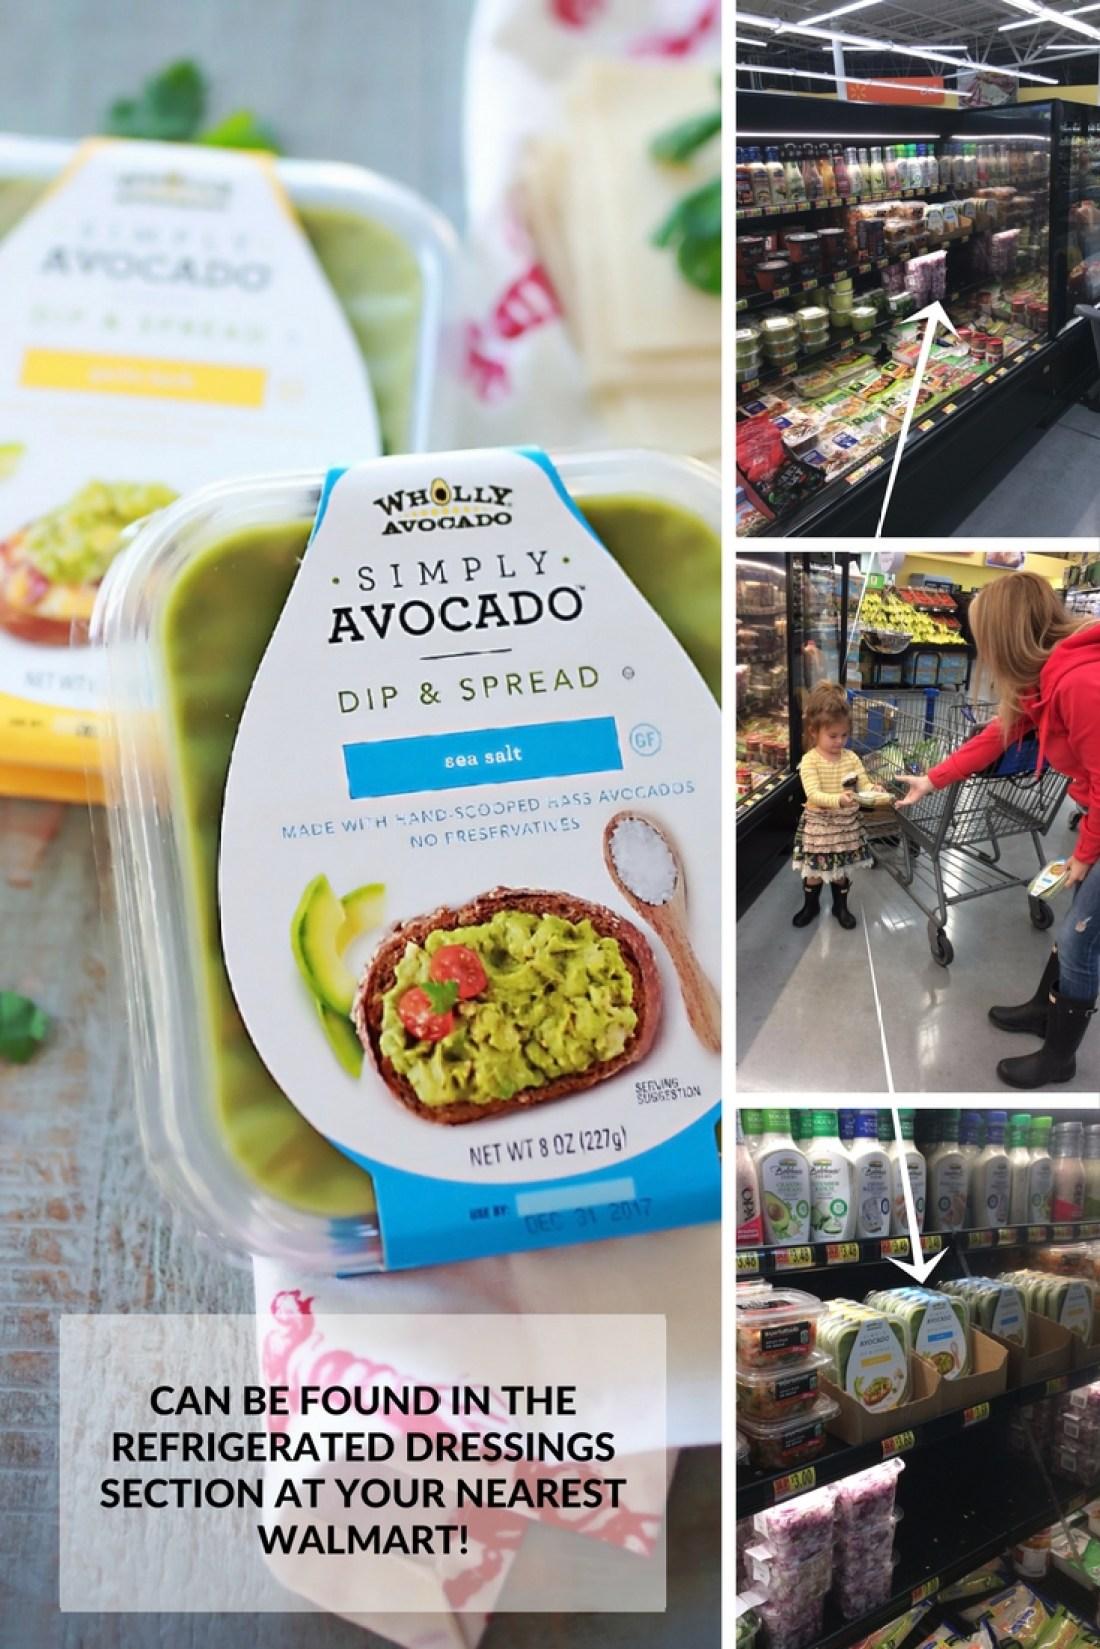 Simply avocado dip can be found at Walmart